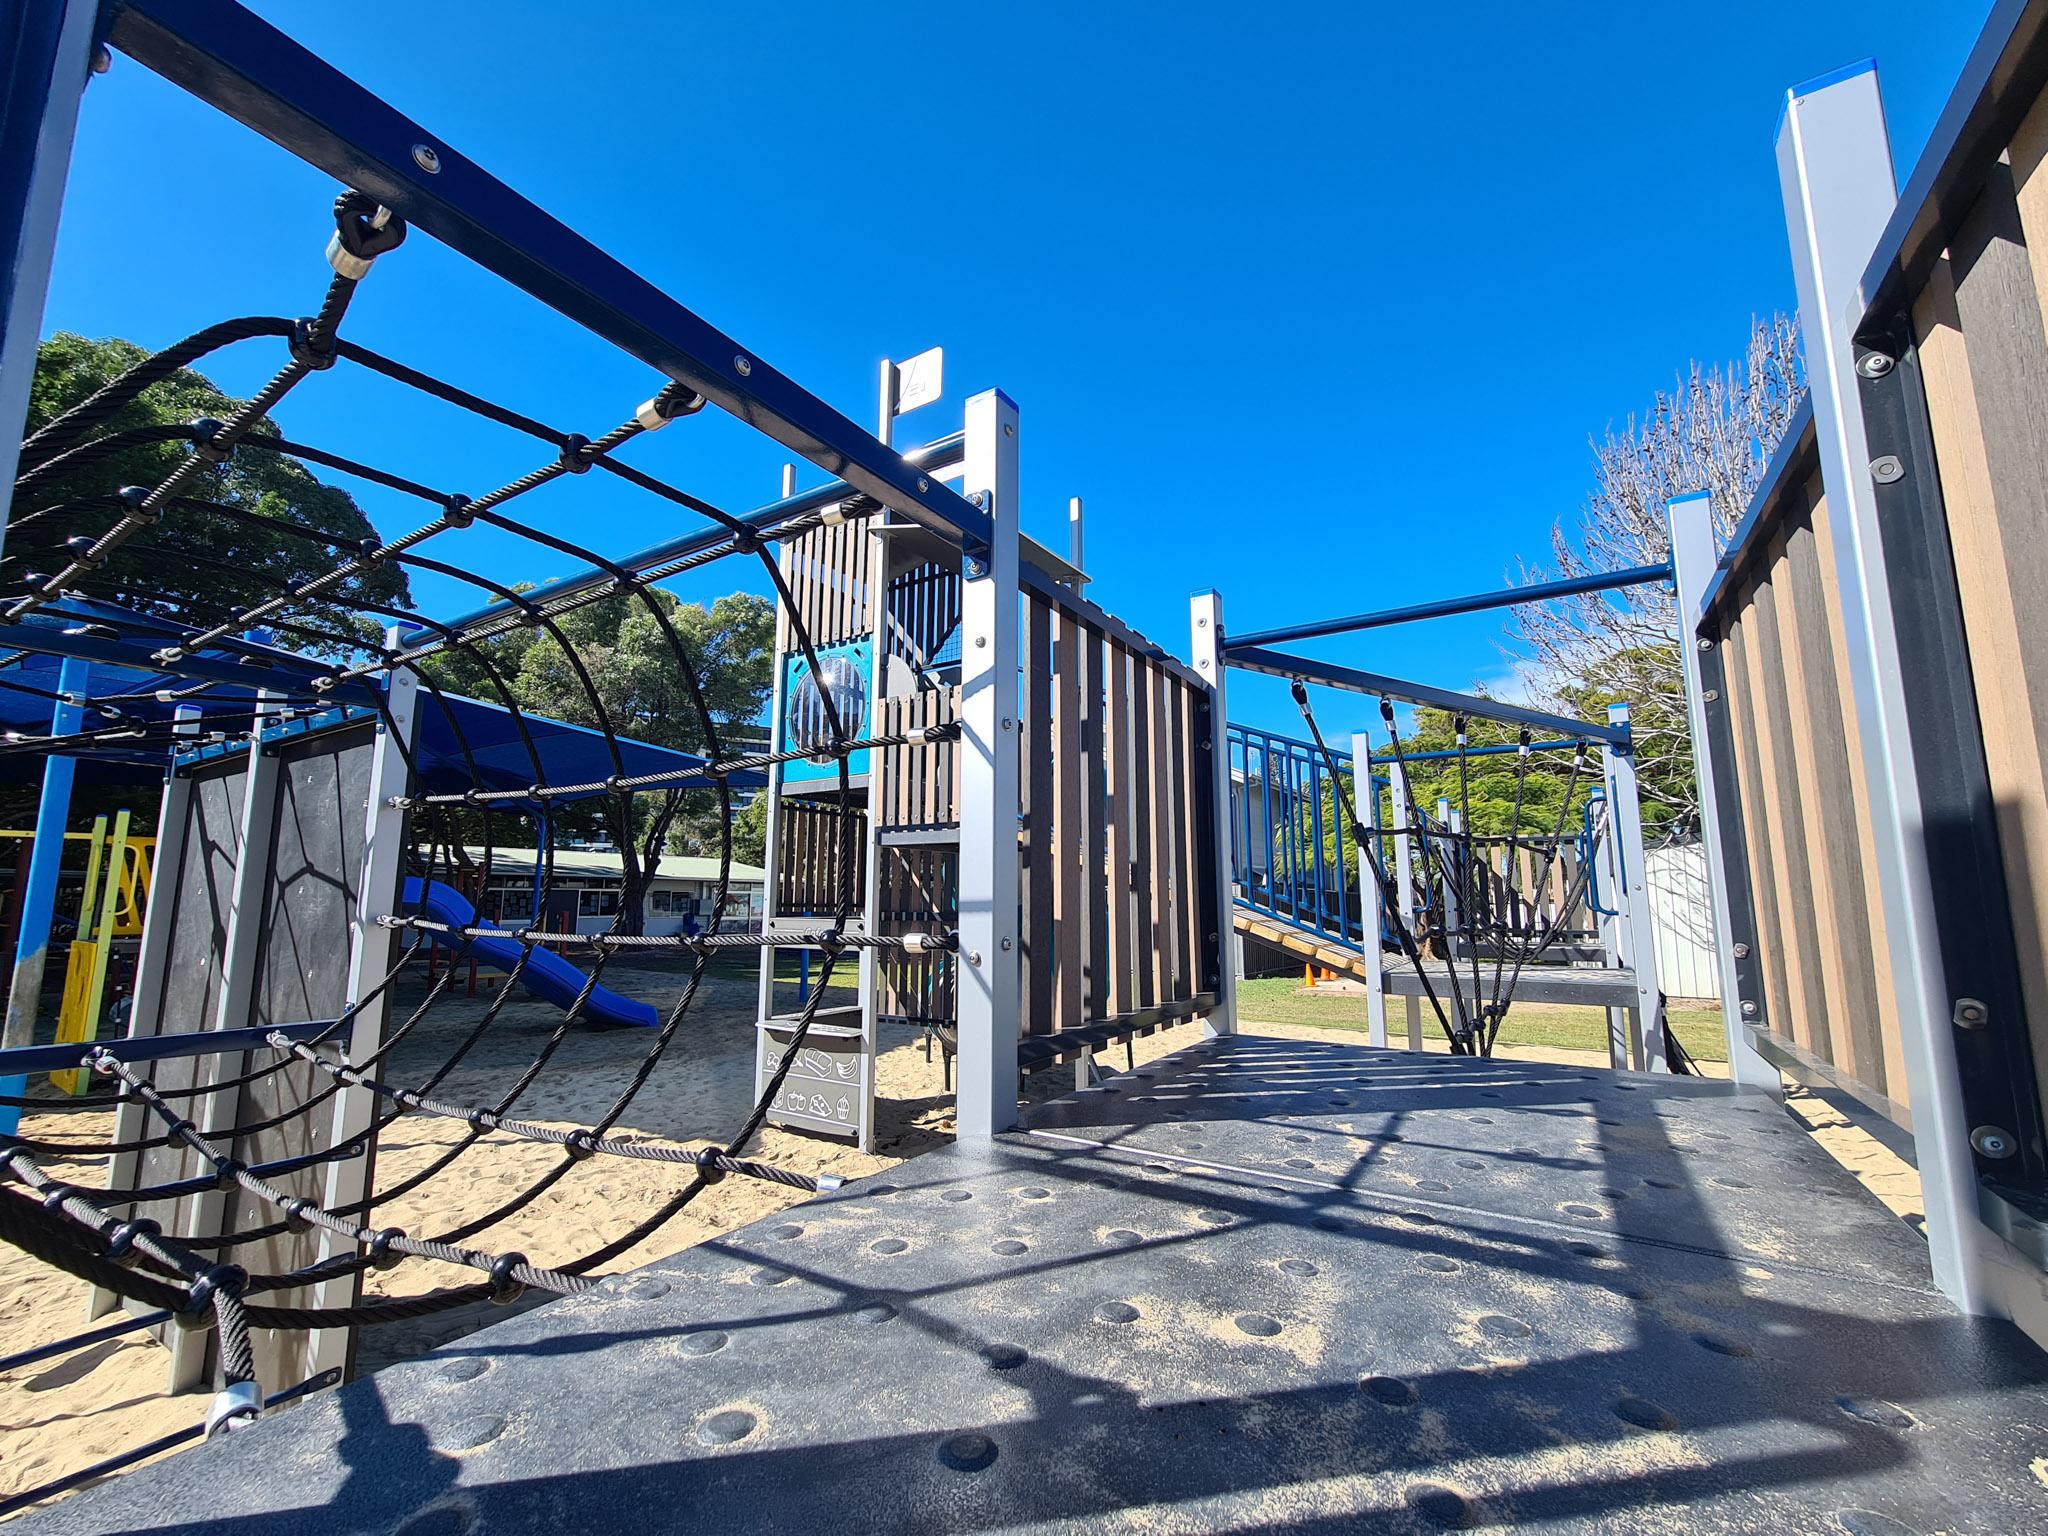 palm-beach-state-school-playrground-austek-play-11